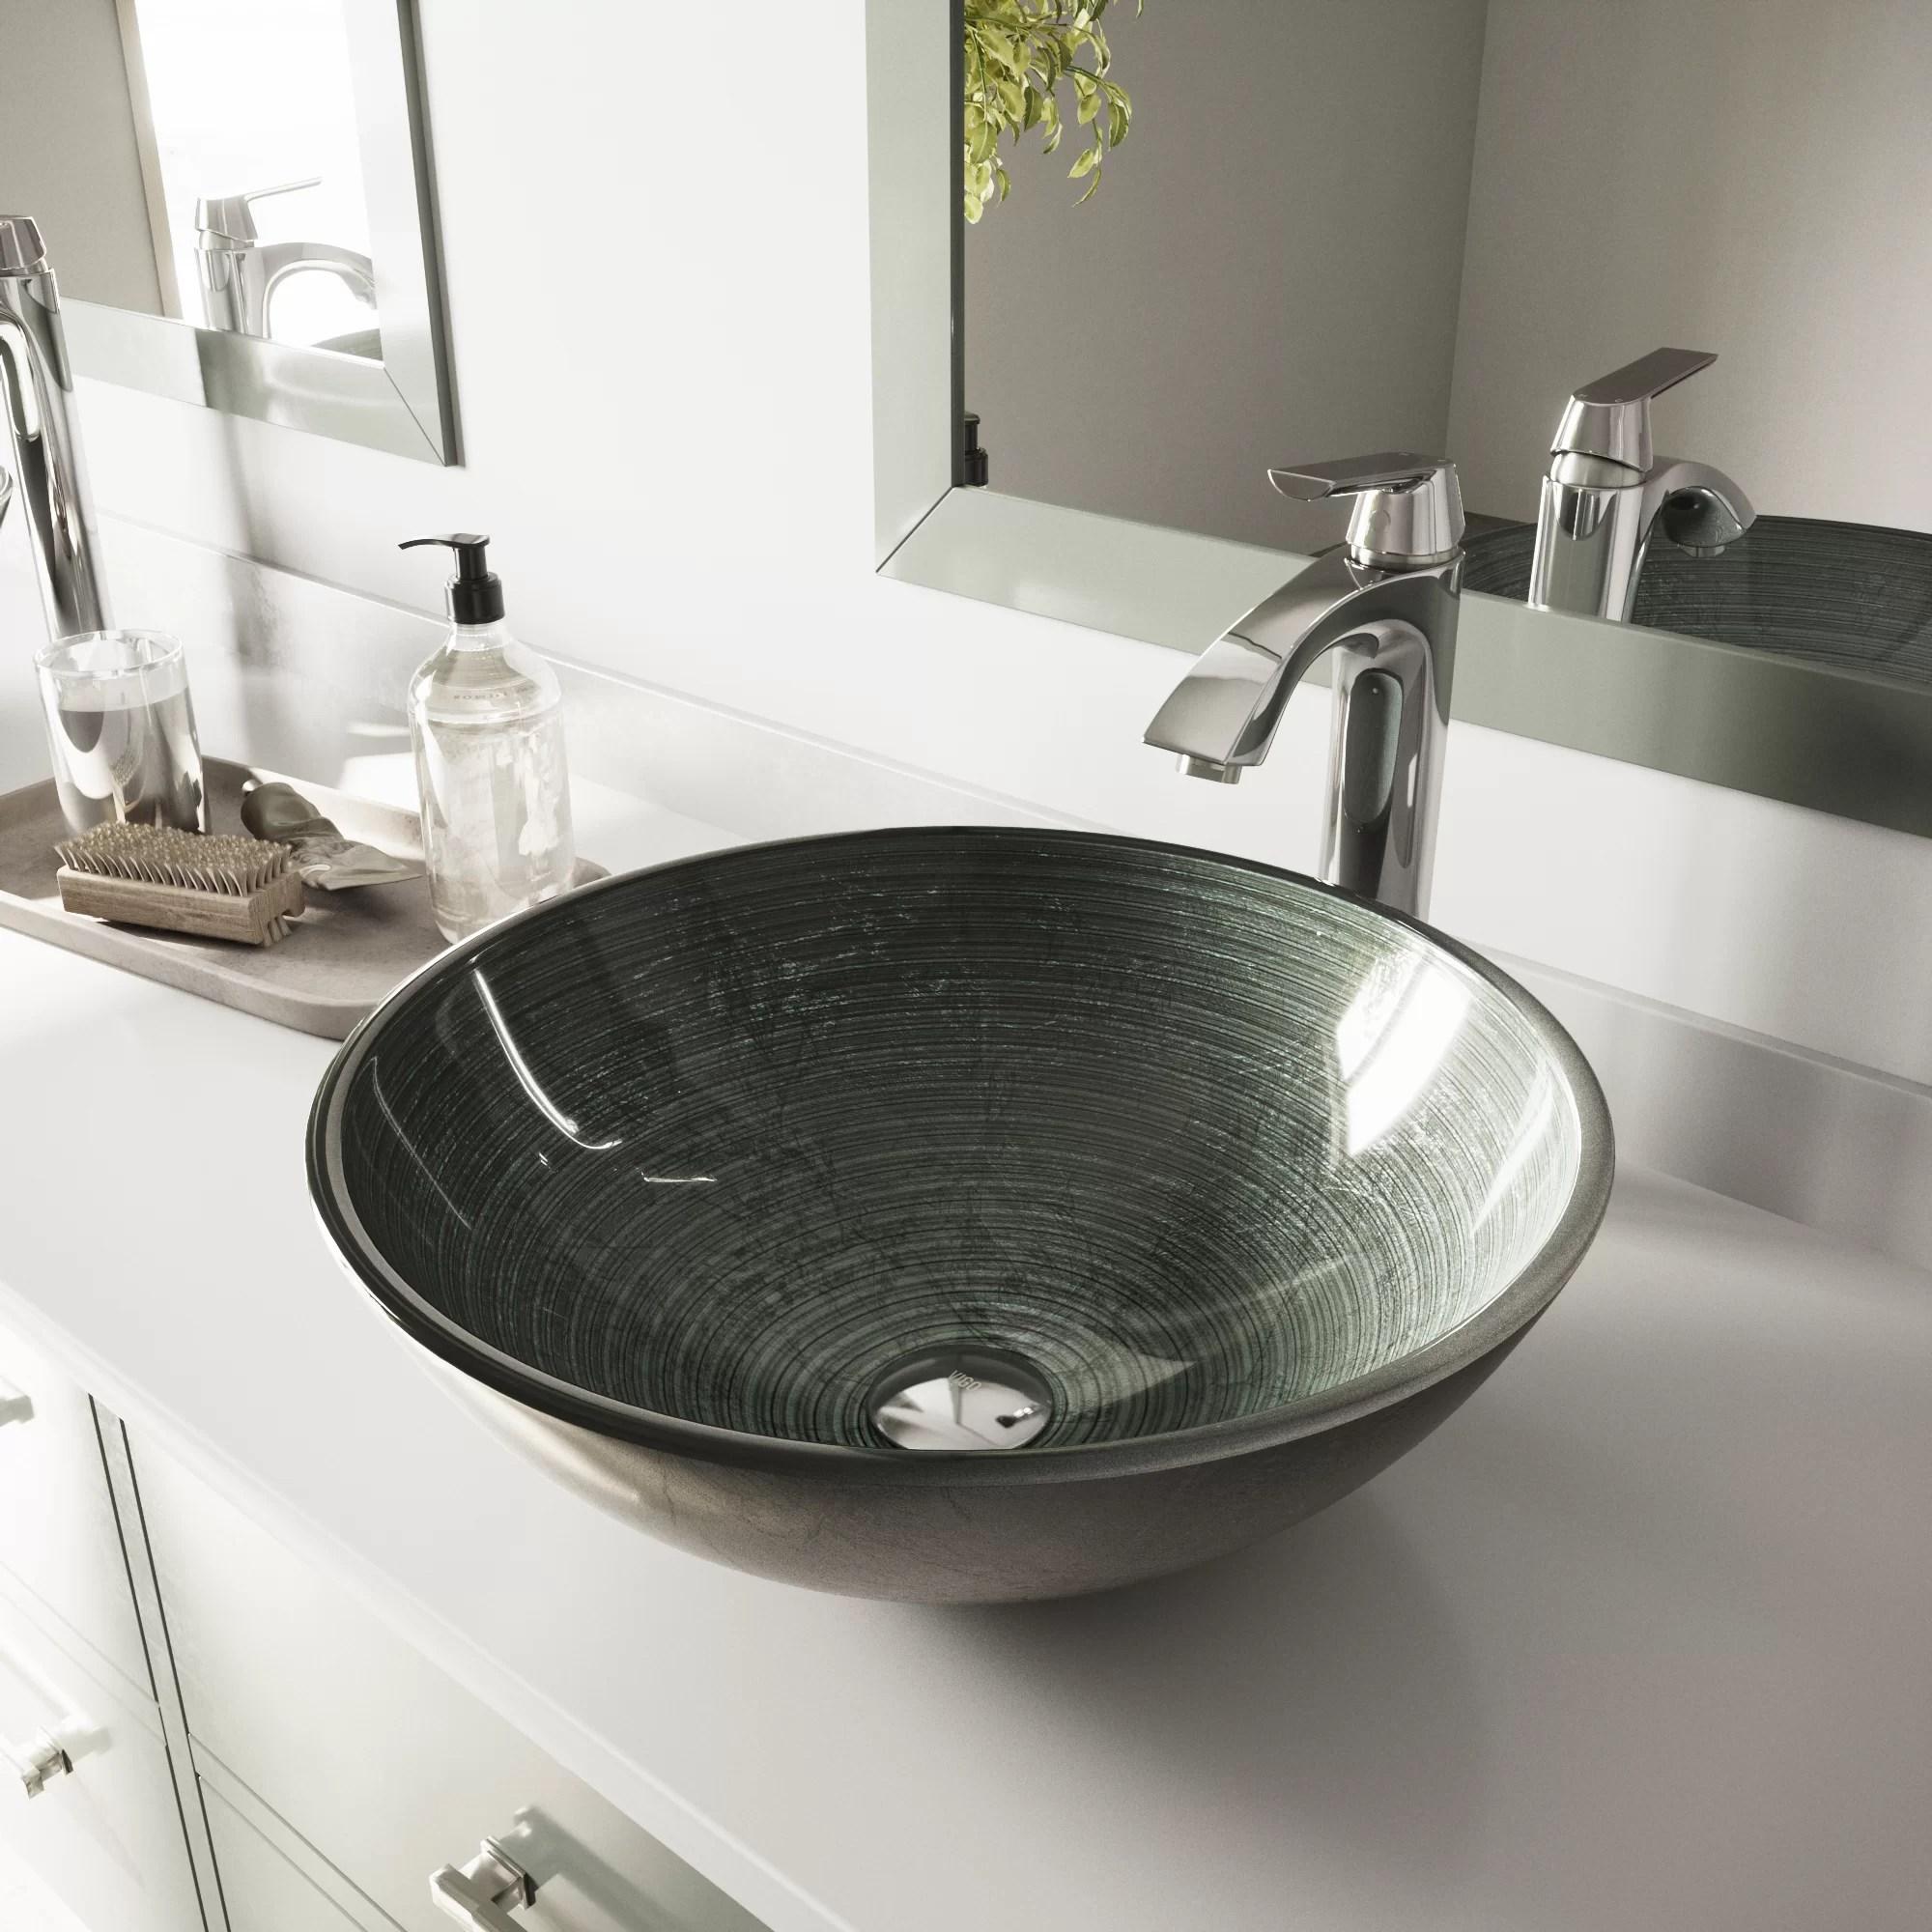 gray tempered glass handmade circular vessel bathroom sink